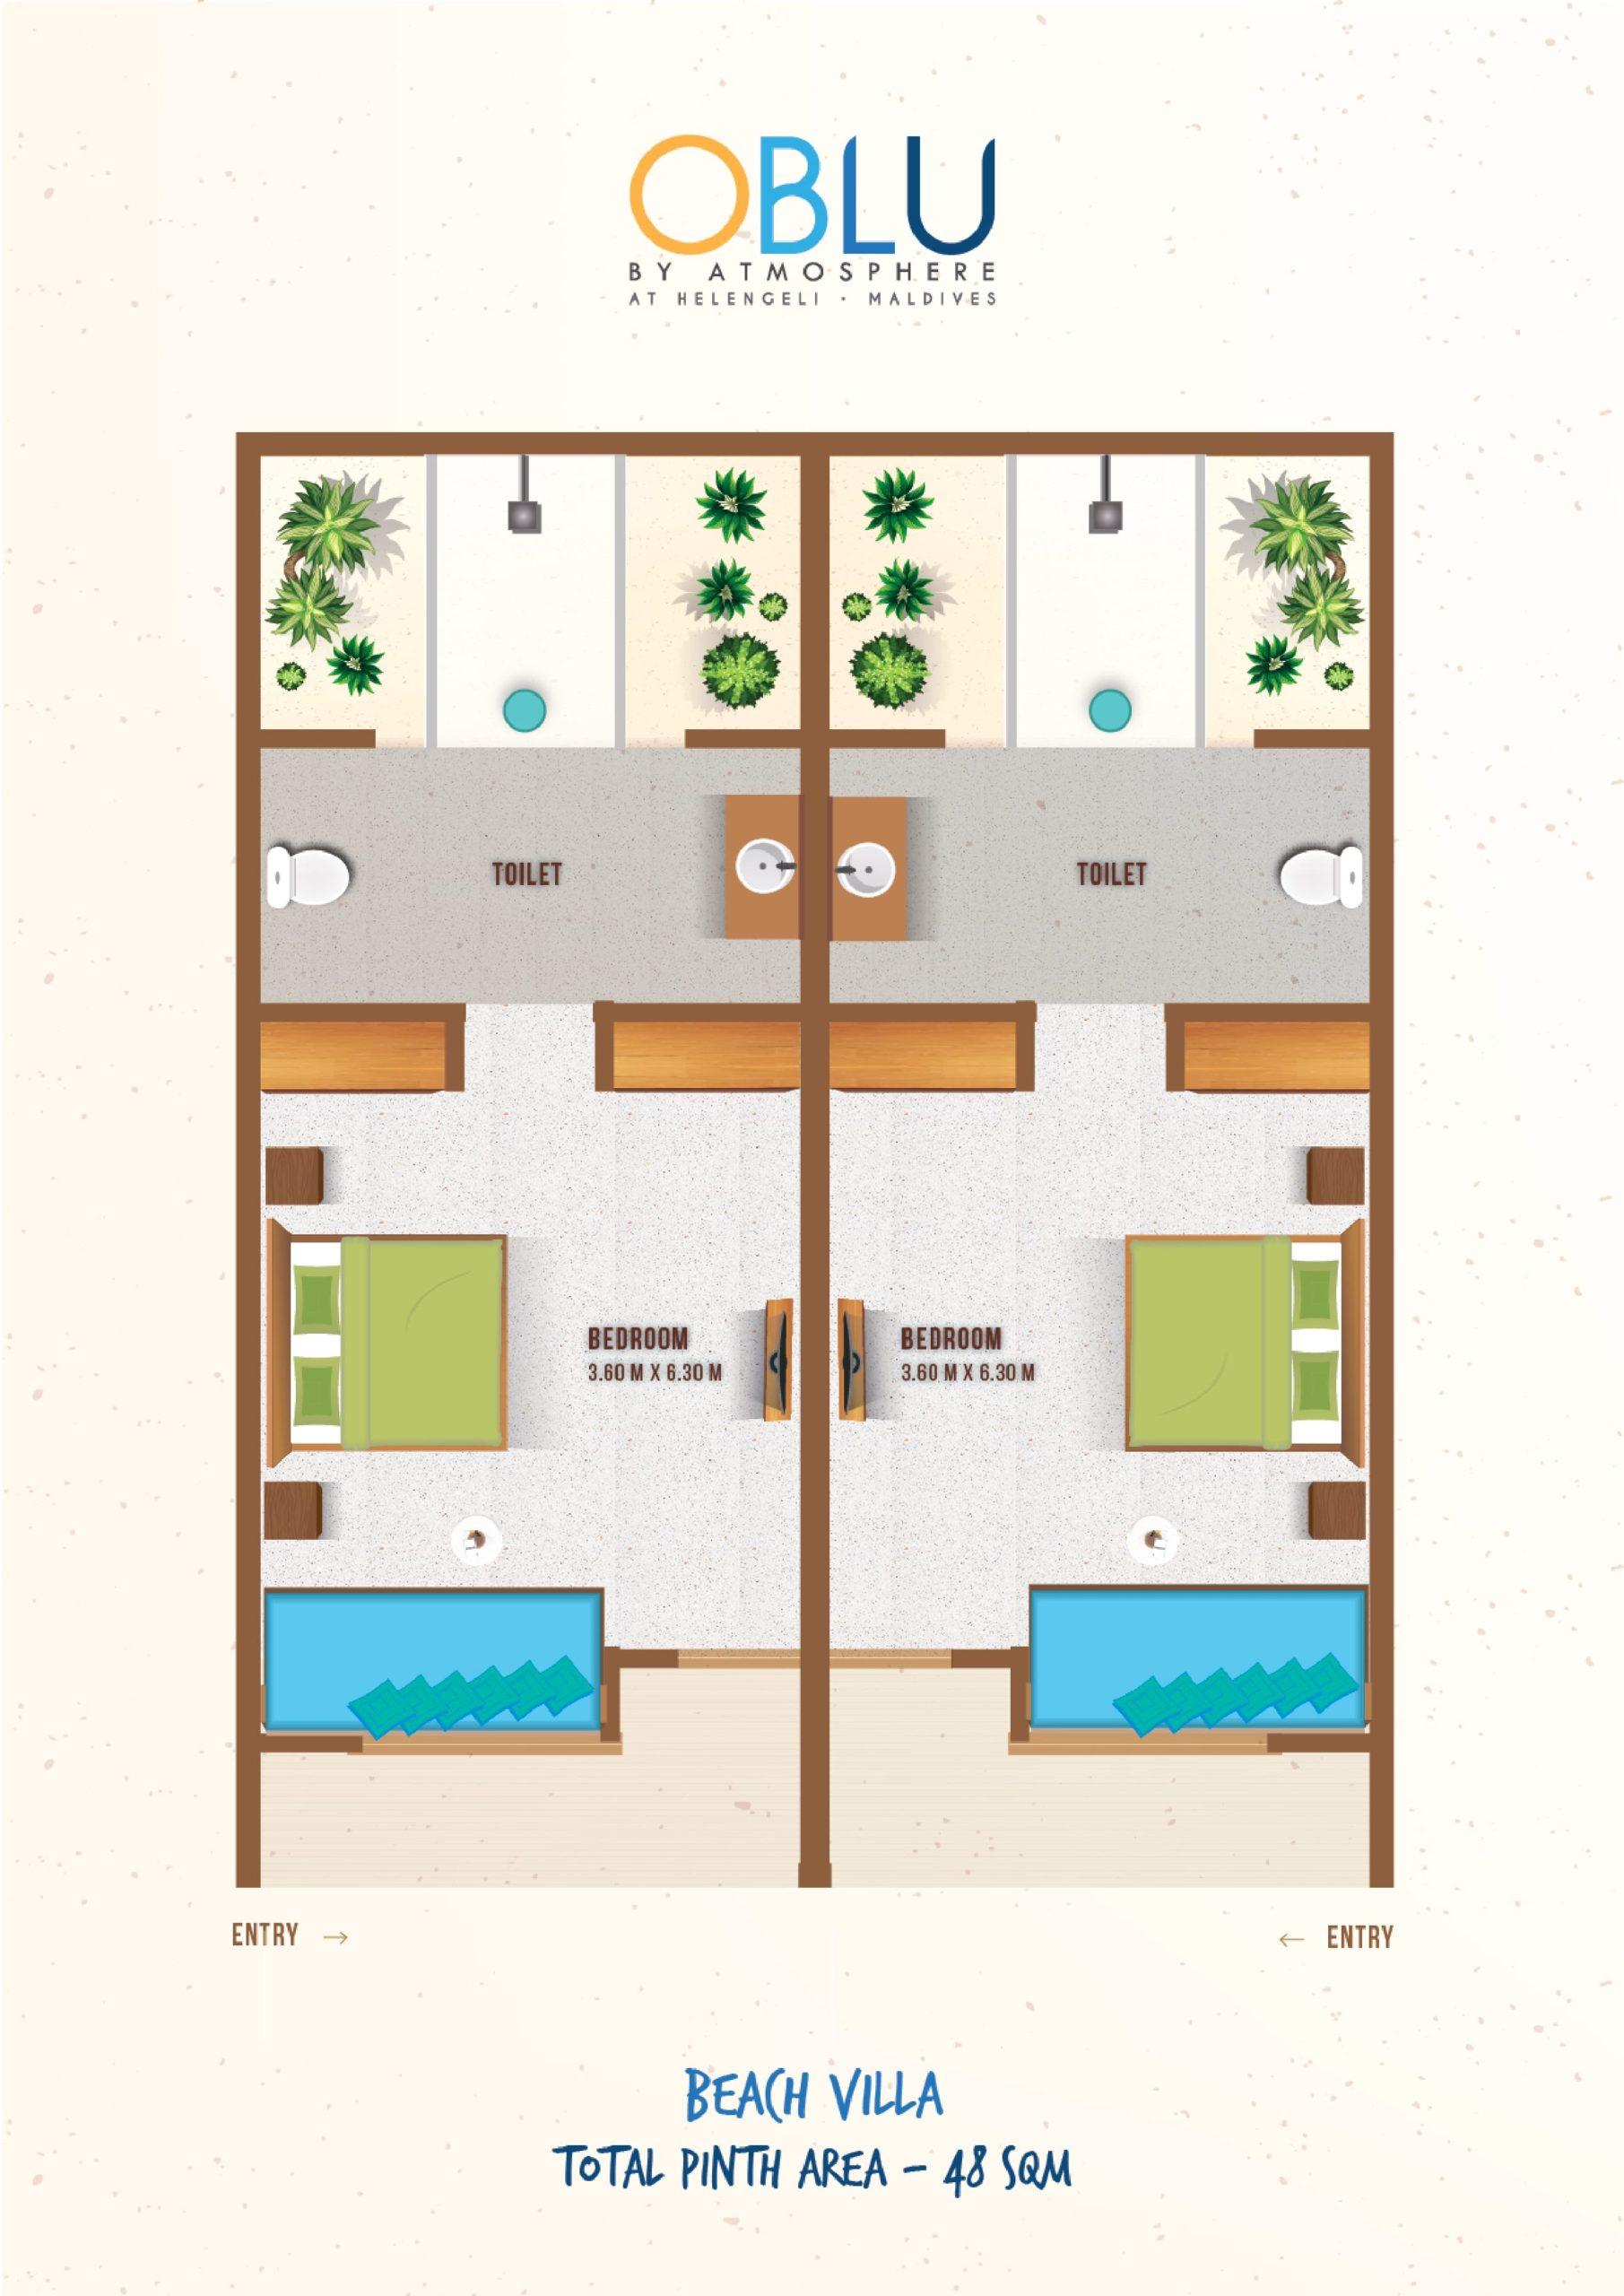 Мальдивы, отель OBLU by Atmosphere at Helengeli, план-схема номера Beach Villa